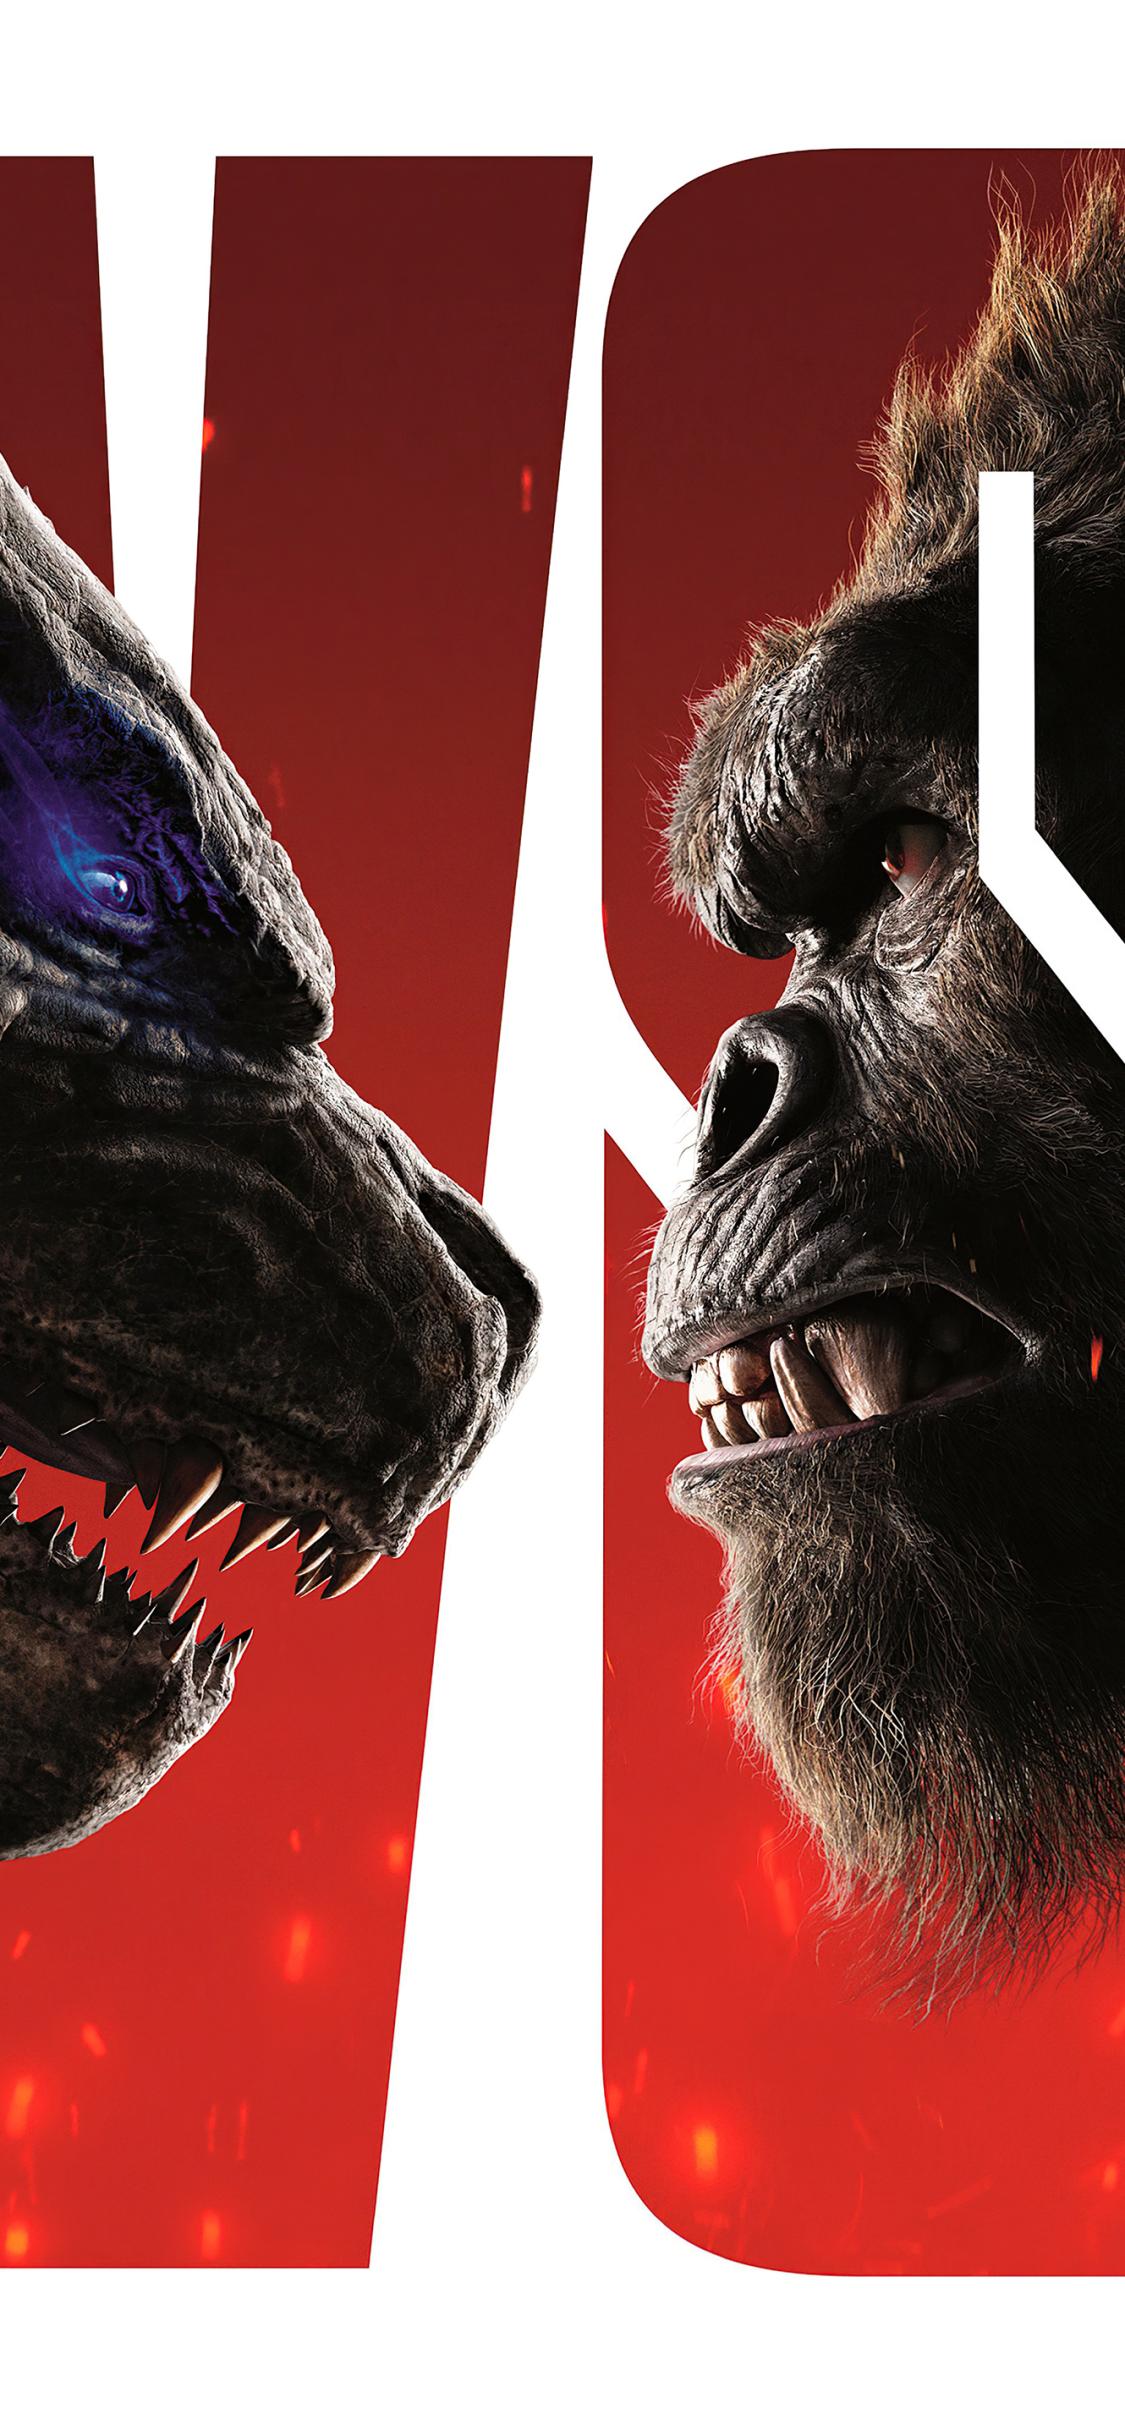 Godzilla Vs Kong mobile wallpaper new